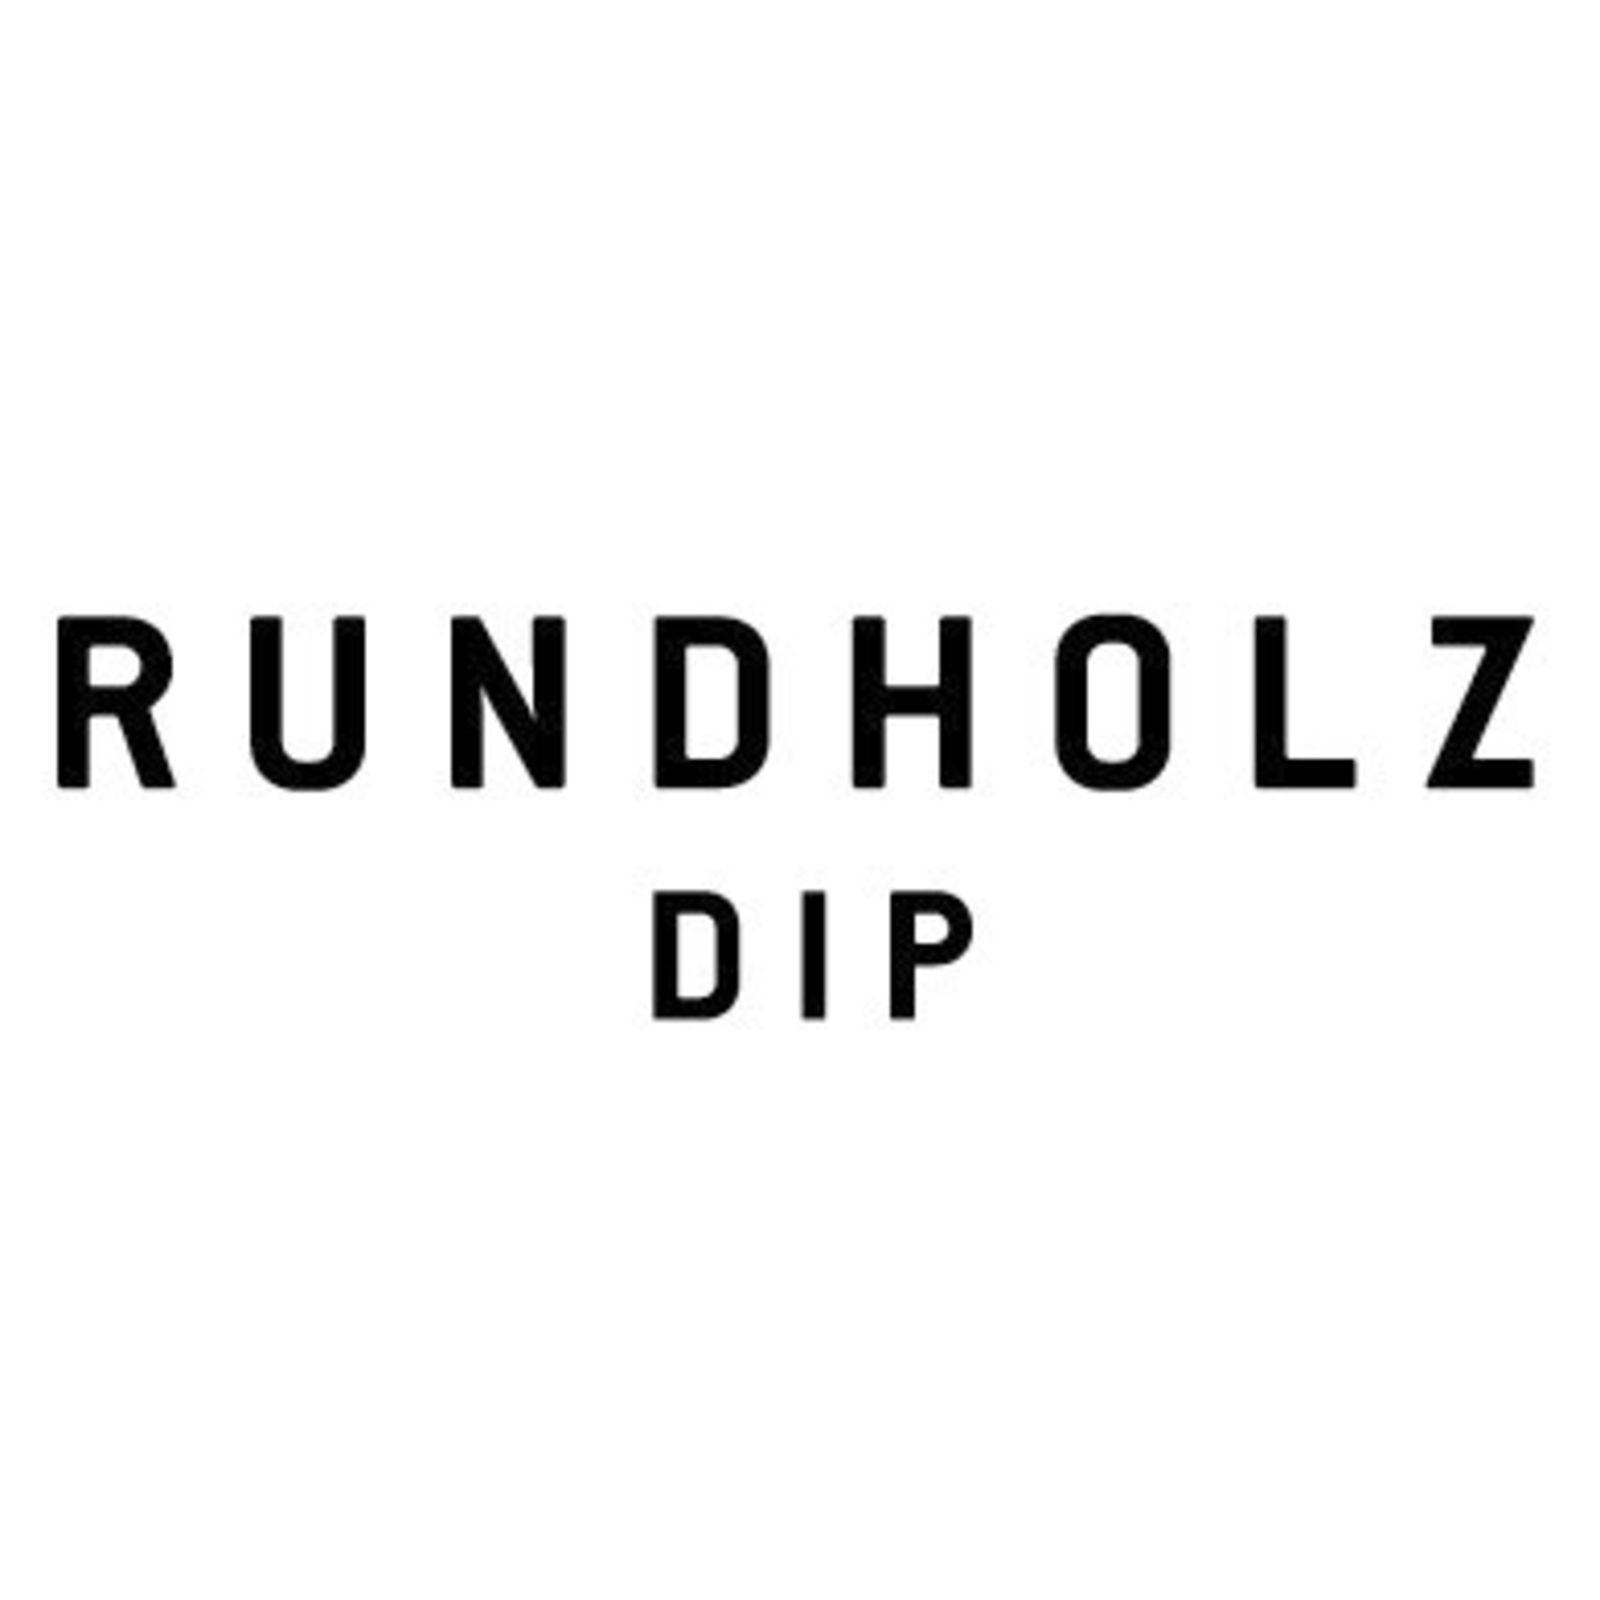 rundholz dip (Image 1)